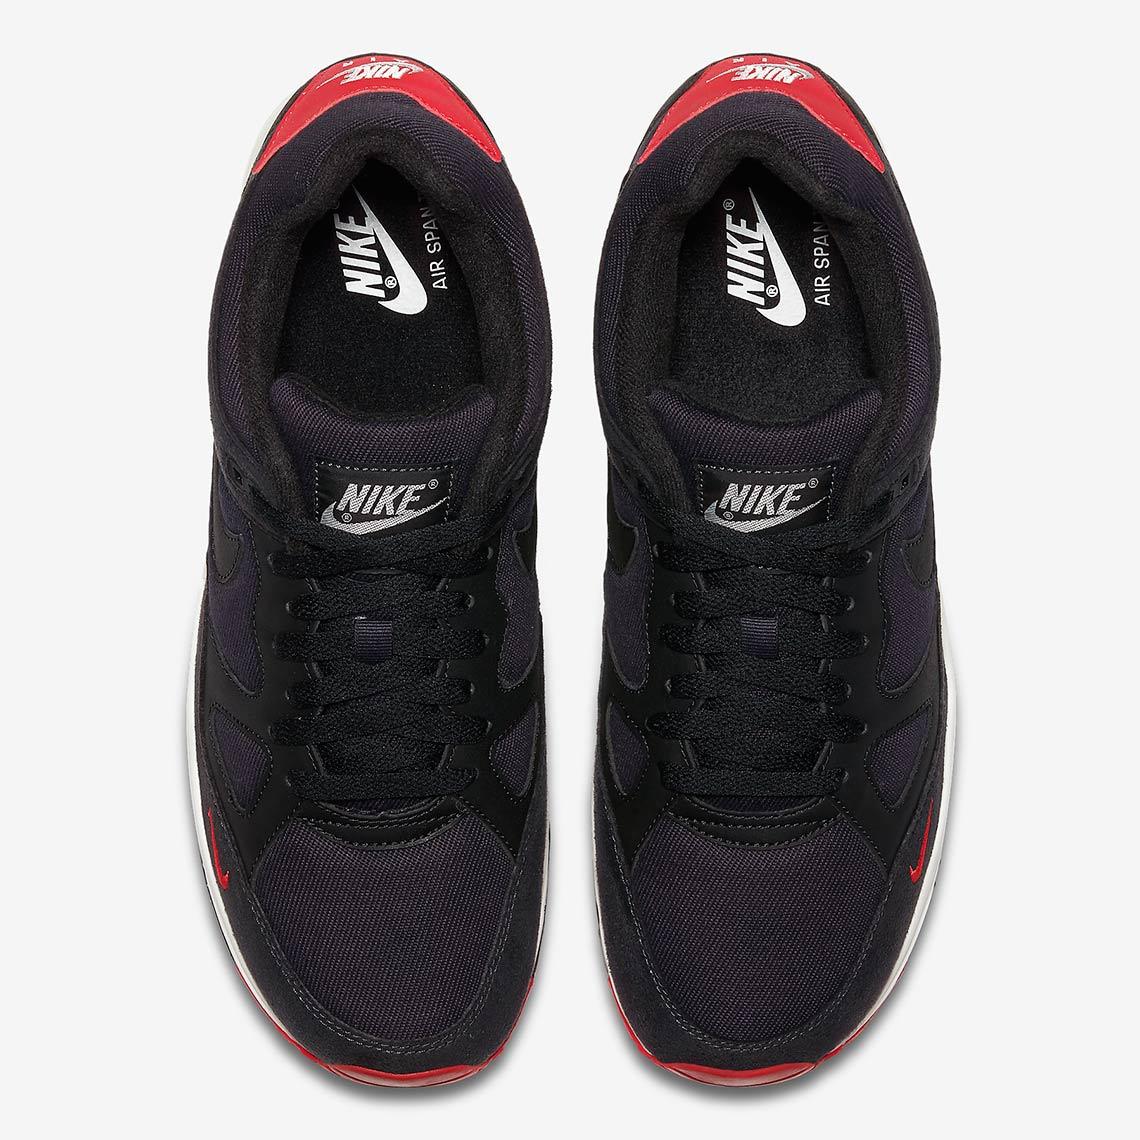 brand new 6dd8c 6cf13 Nike Air Span 2 AQ3120-002 + AQ3120-400 Release Info   SneakerNews.com